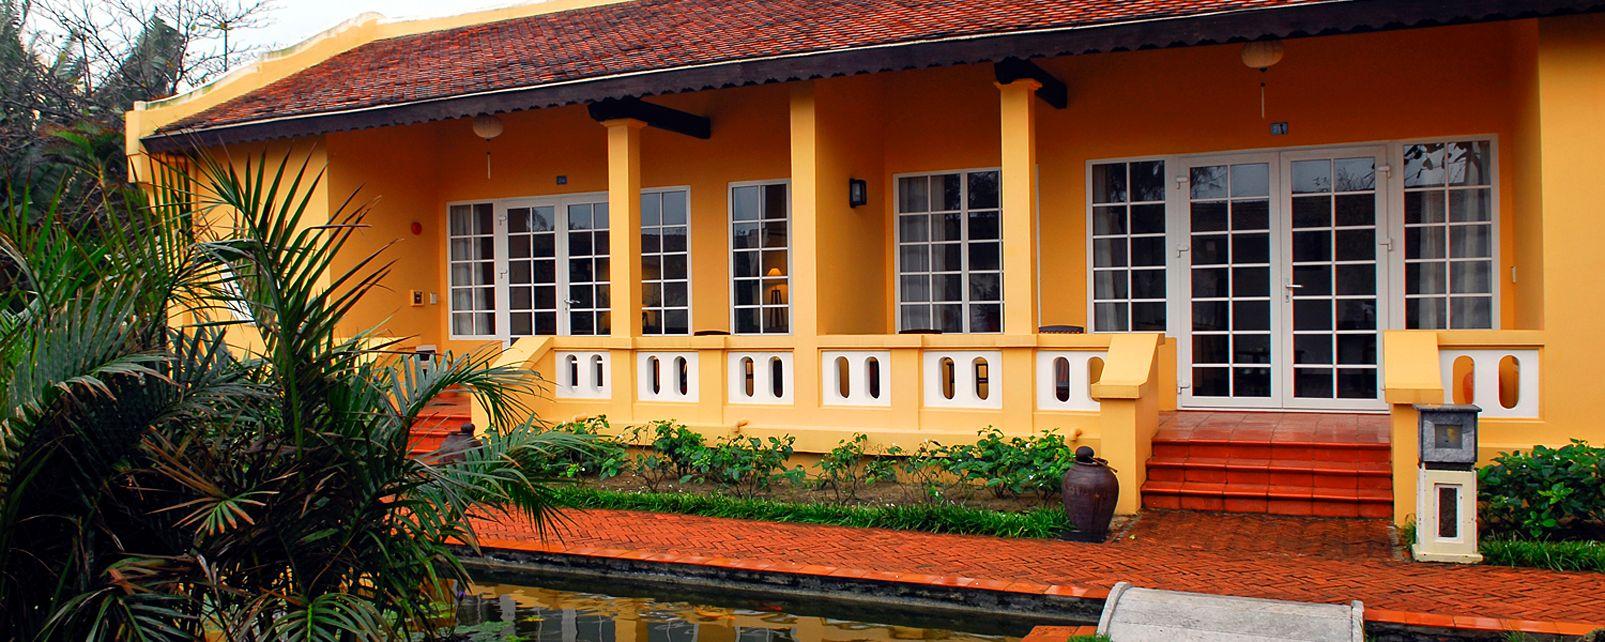 Hôtel Victoria Hoi An